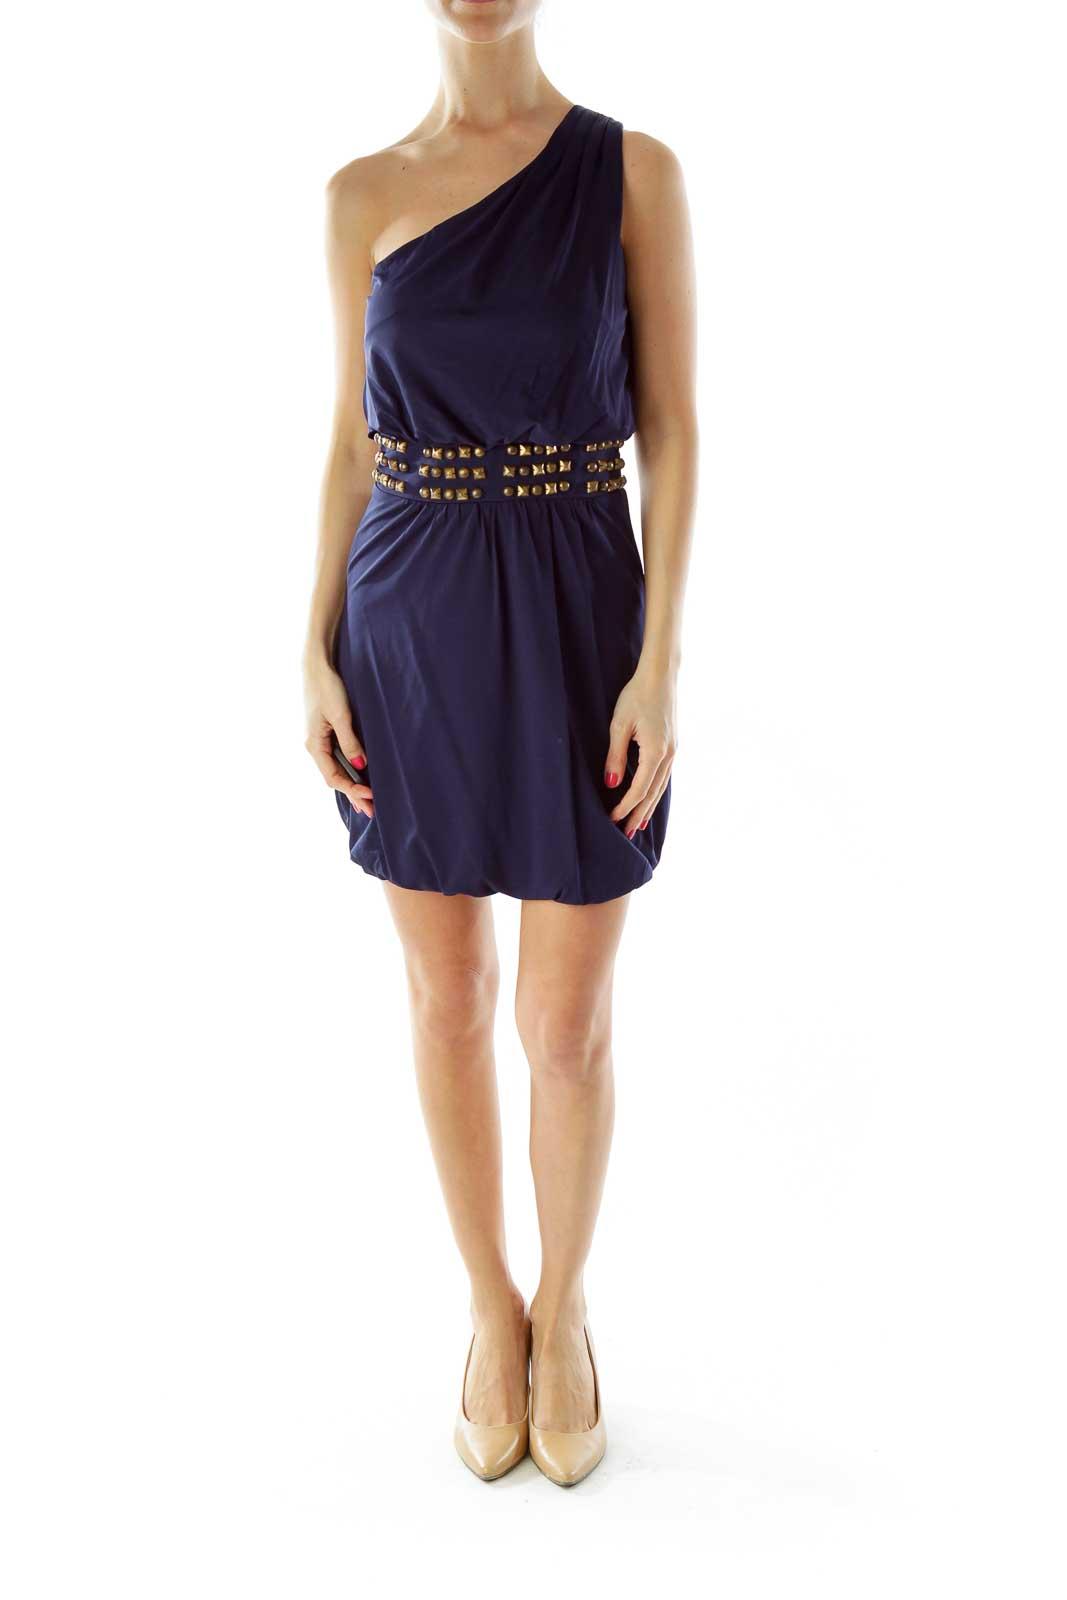 Blue Studded Cocktail Dress